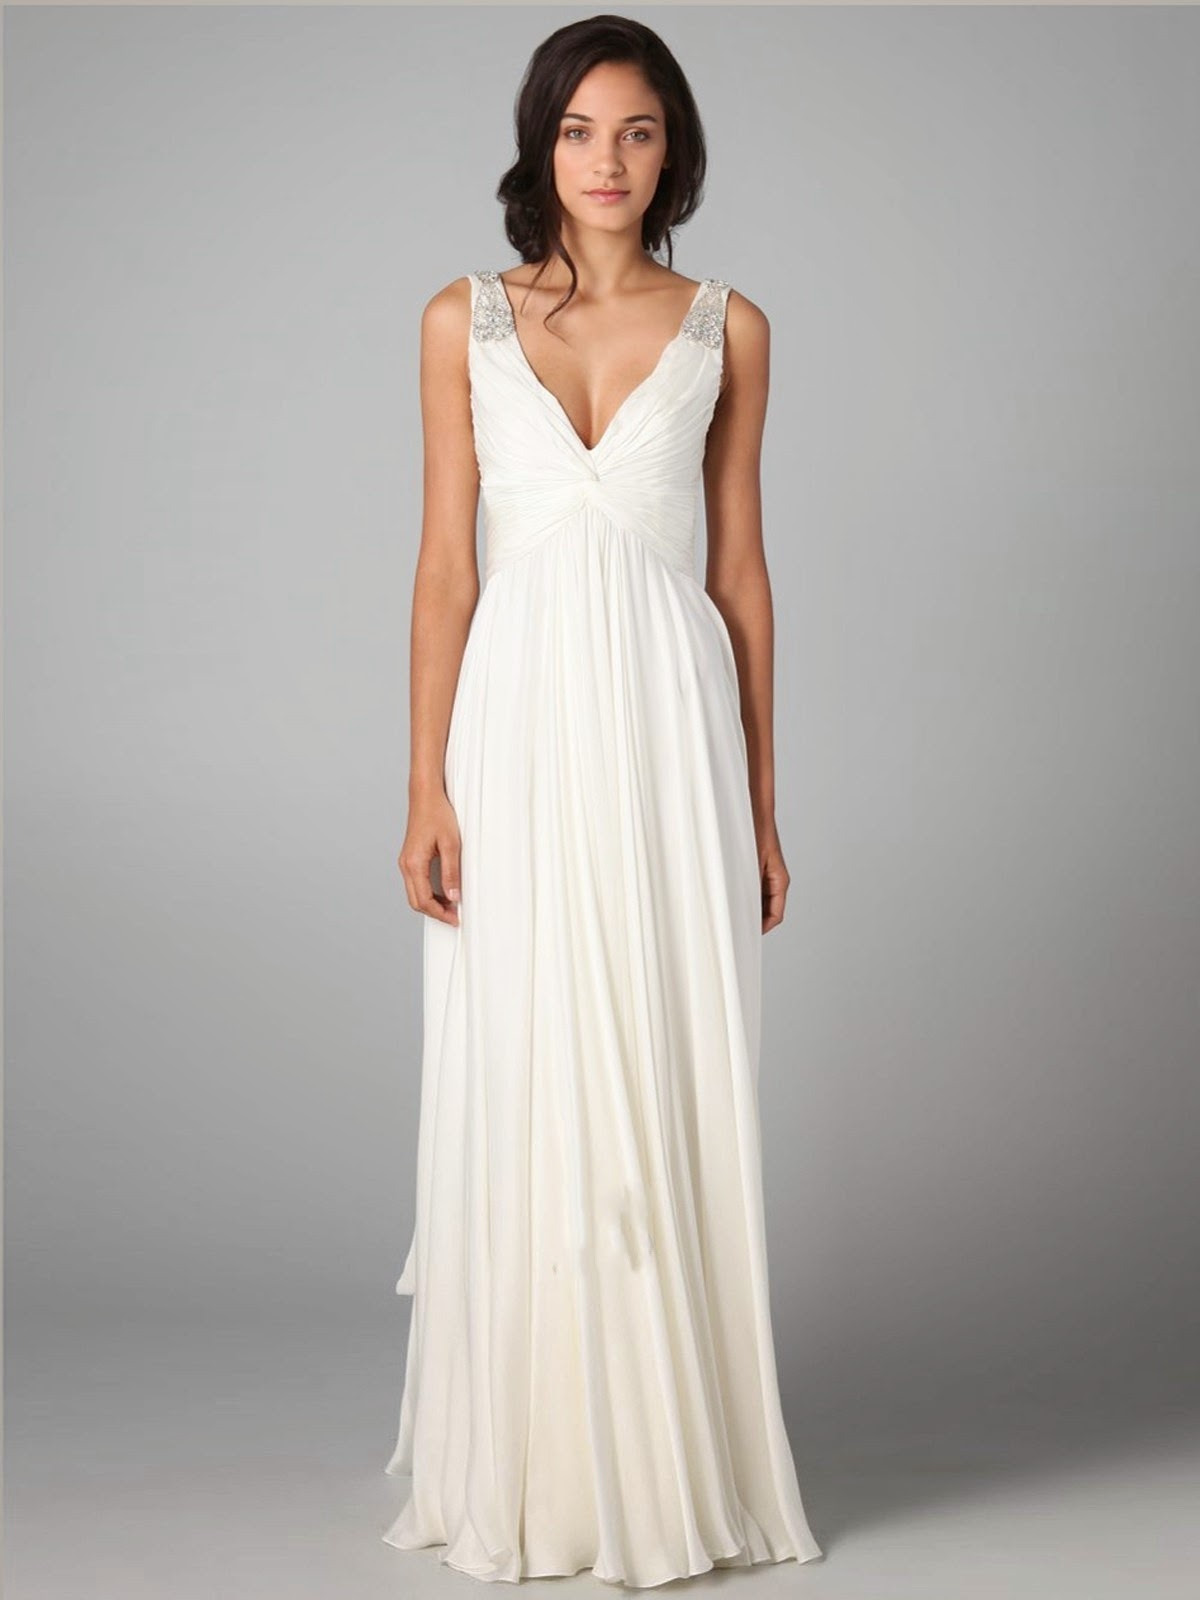 aeee3087712 Robe De Mariée Style Grecque intérieur robes de mariée de style grec ...